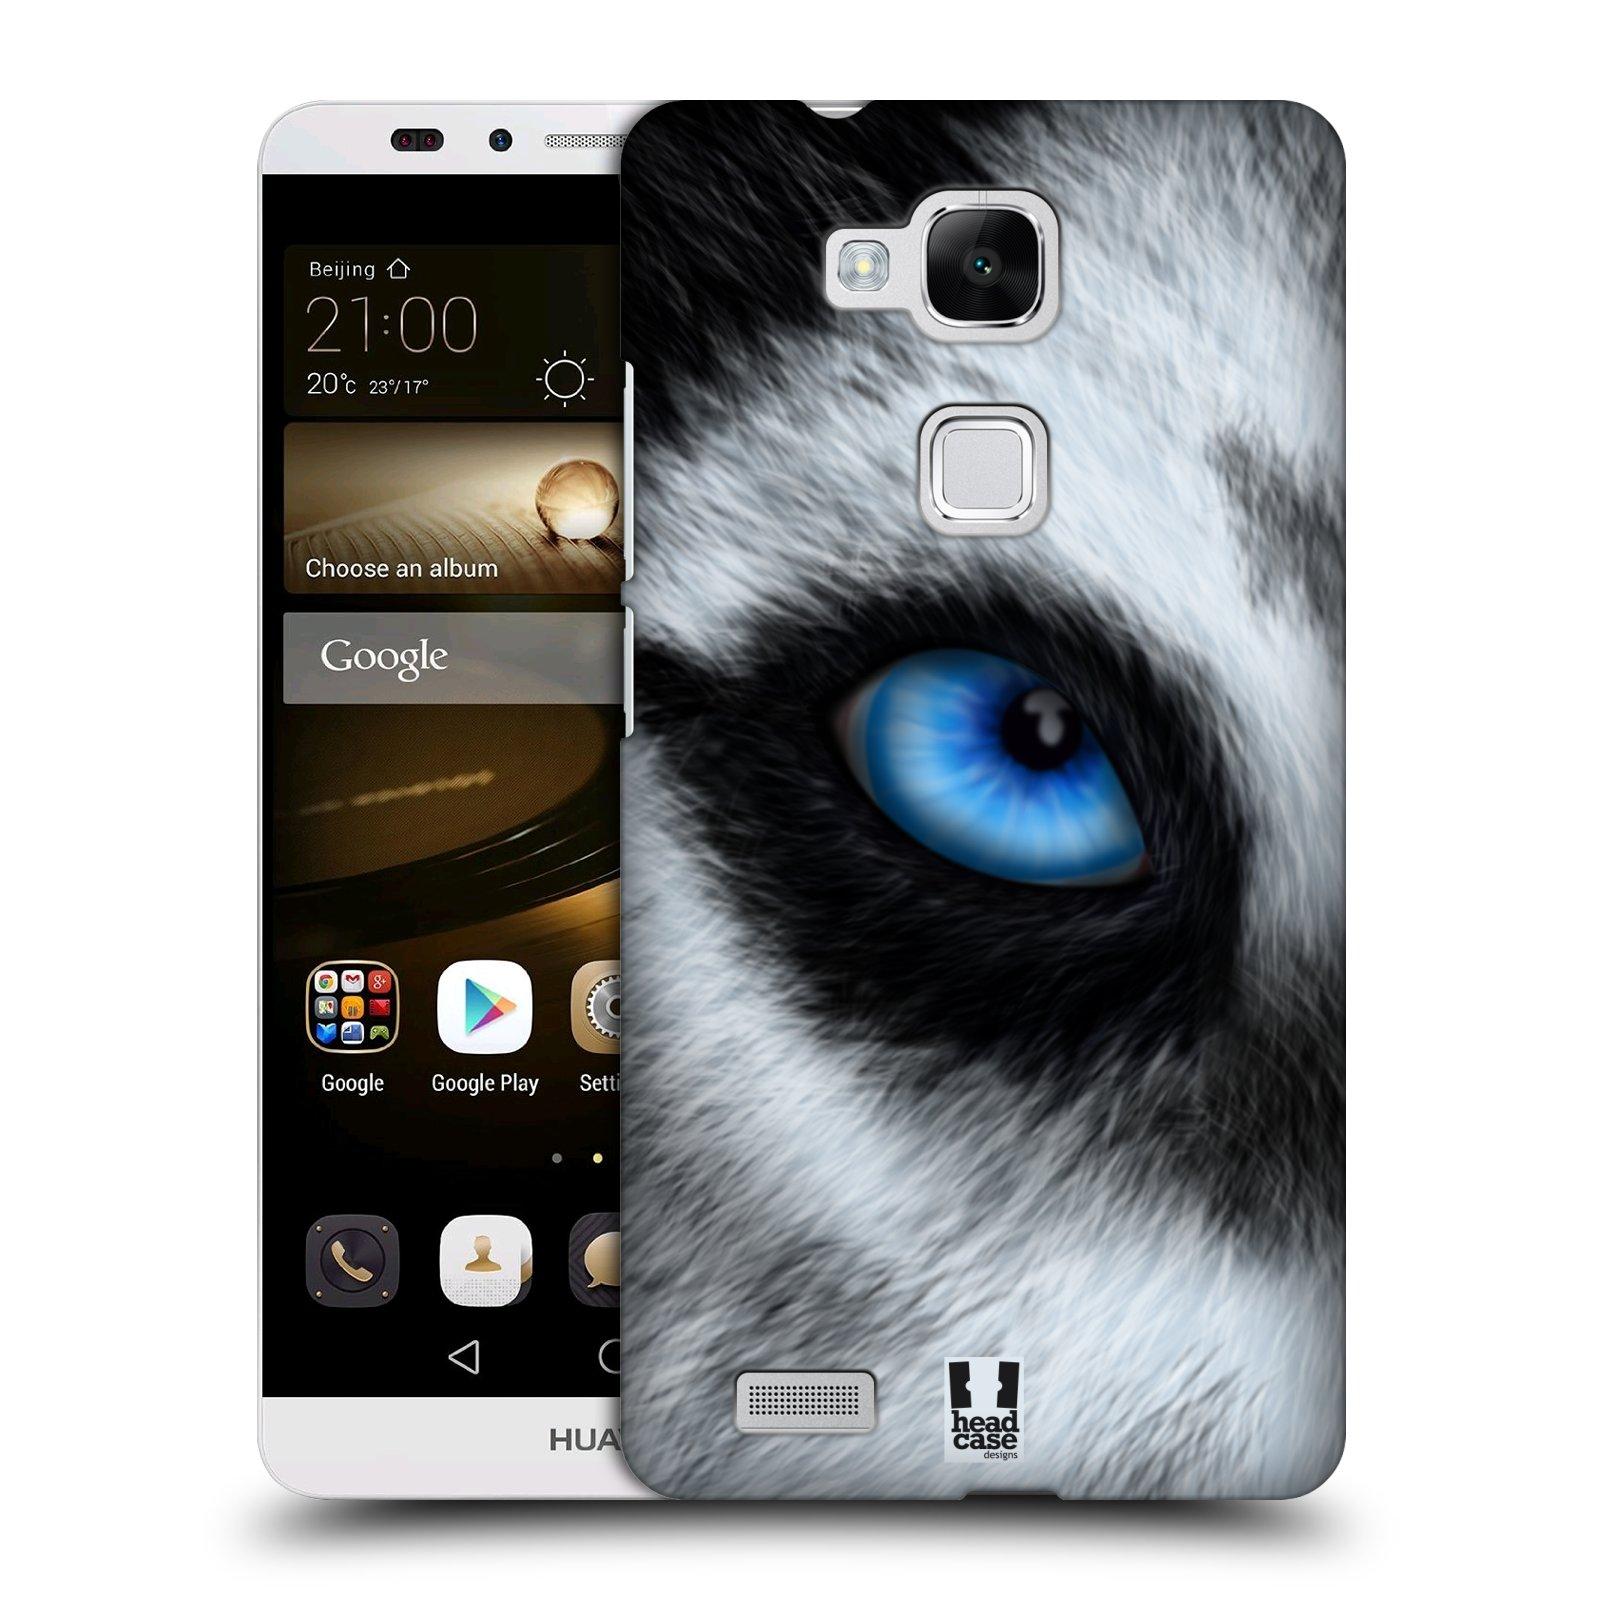 HEAD CASE plastový obal na mobil Huawei Mate 7 vzor pohled zvířete oko pes husky